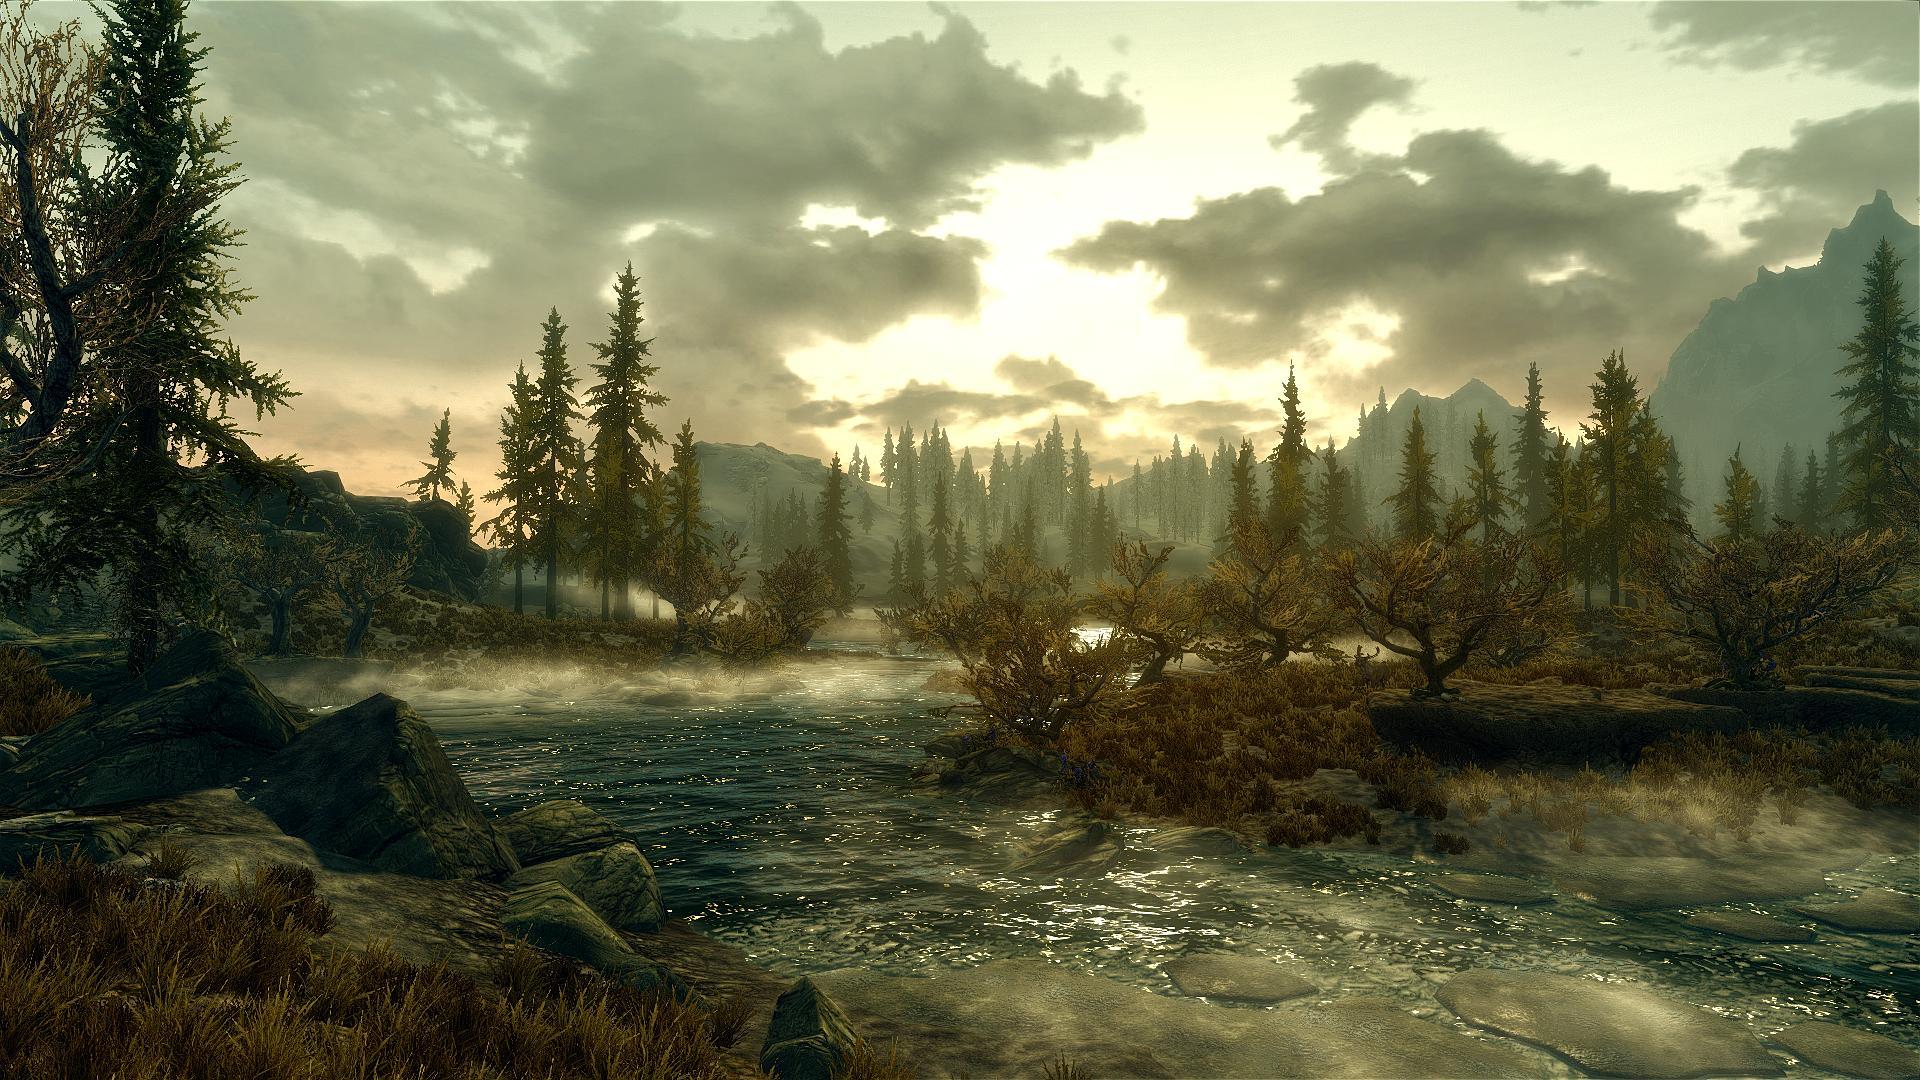 http://www.gamesajare.com/2.0/wp-content/uploads/2015/06/Skyrim-Landscape-1.jpg